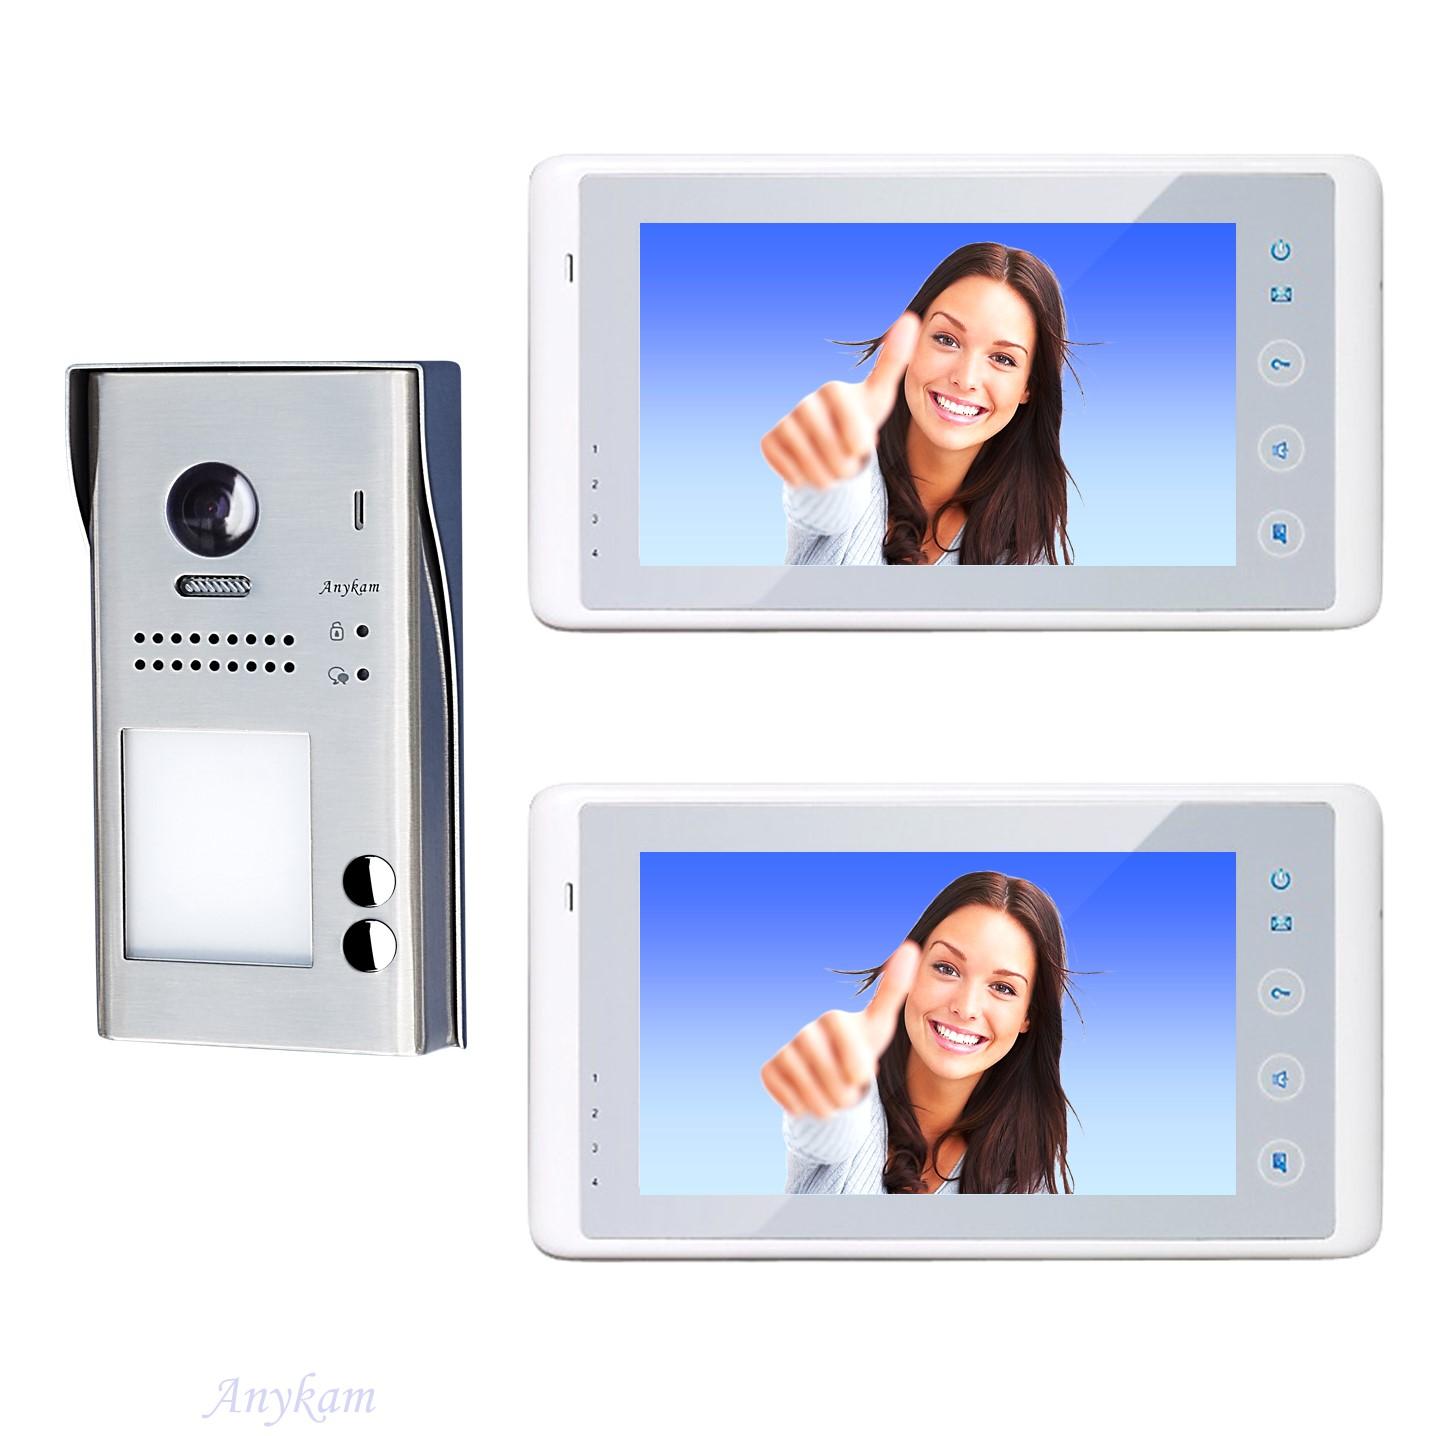 video t rsprechanlage 2 draht gegensprechanlage klingel mit 170grad kamera 60727 ebay. Black Bedroom Furniture Sets. Home Design Ideas